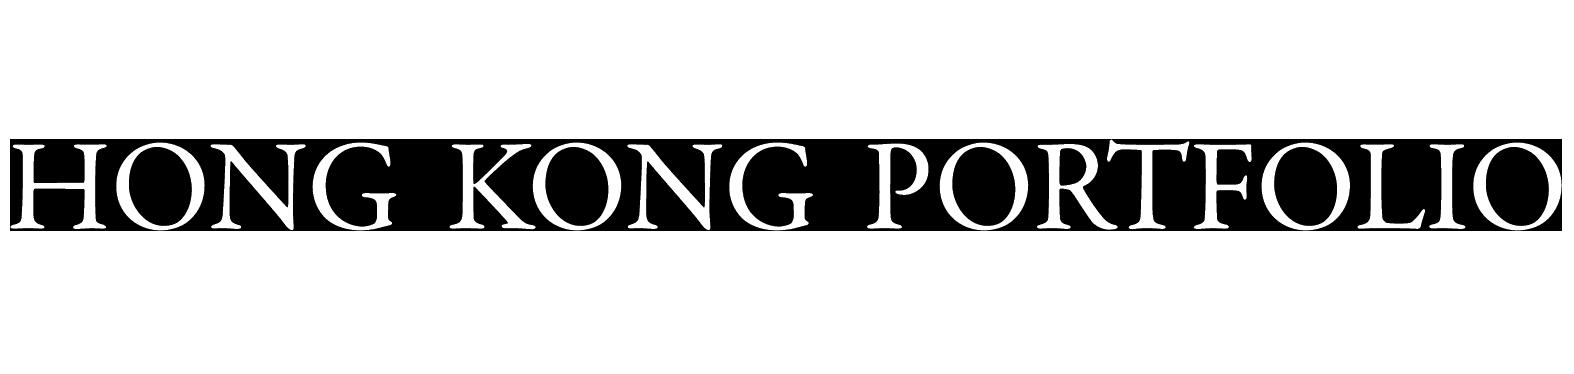 hkportfolio-test-2.png